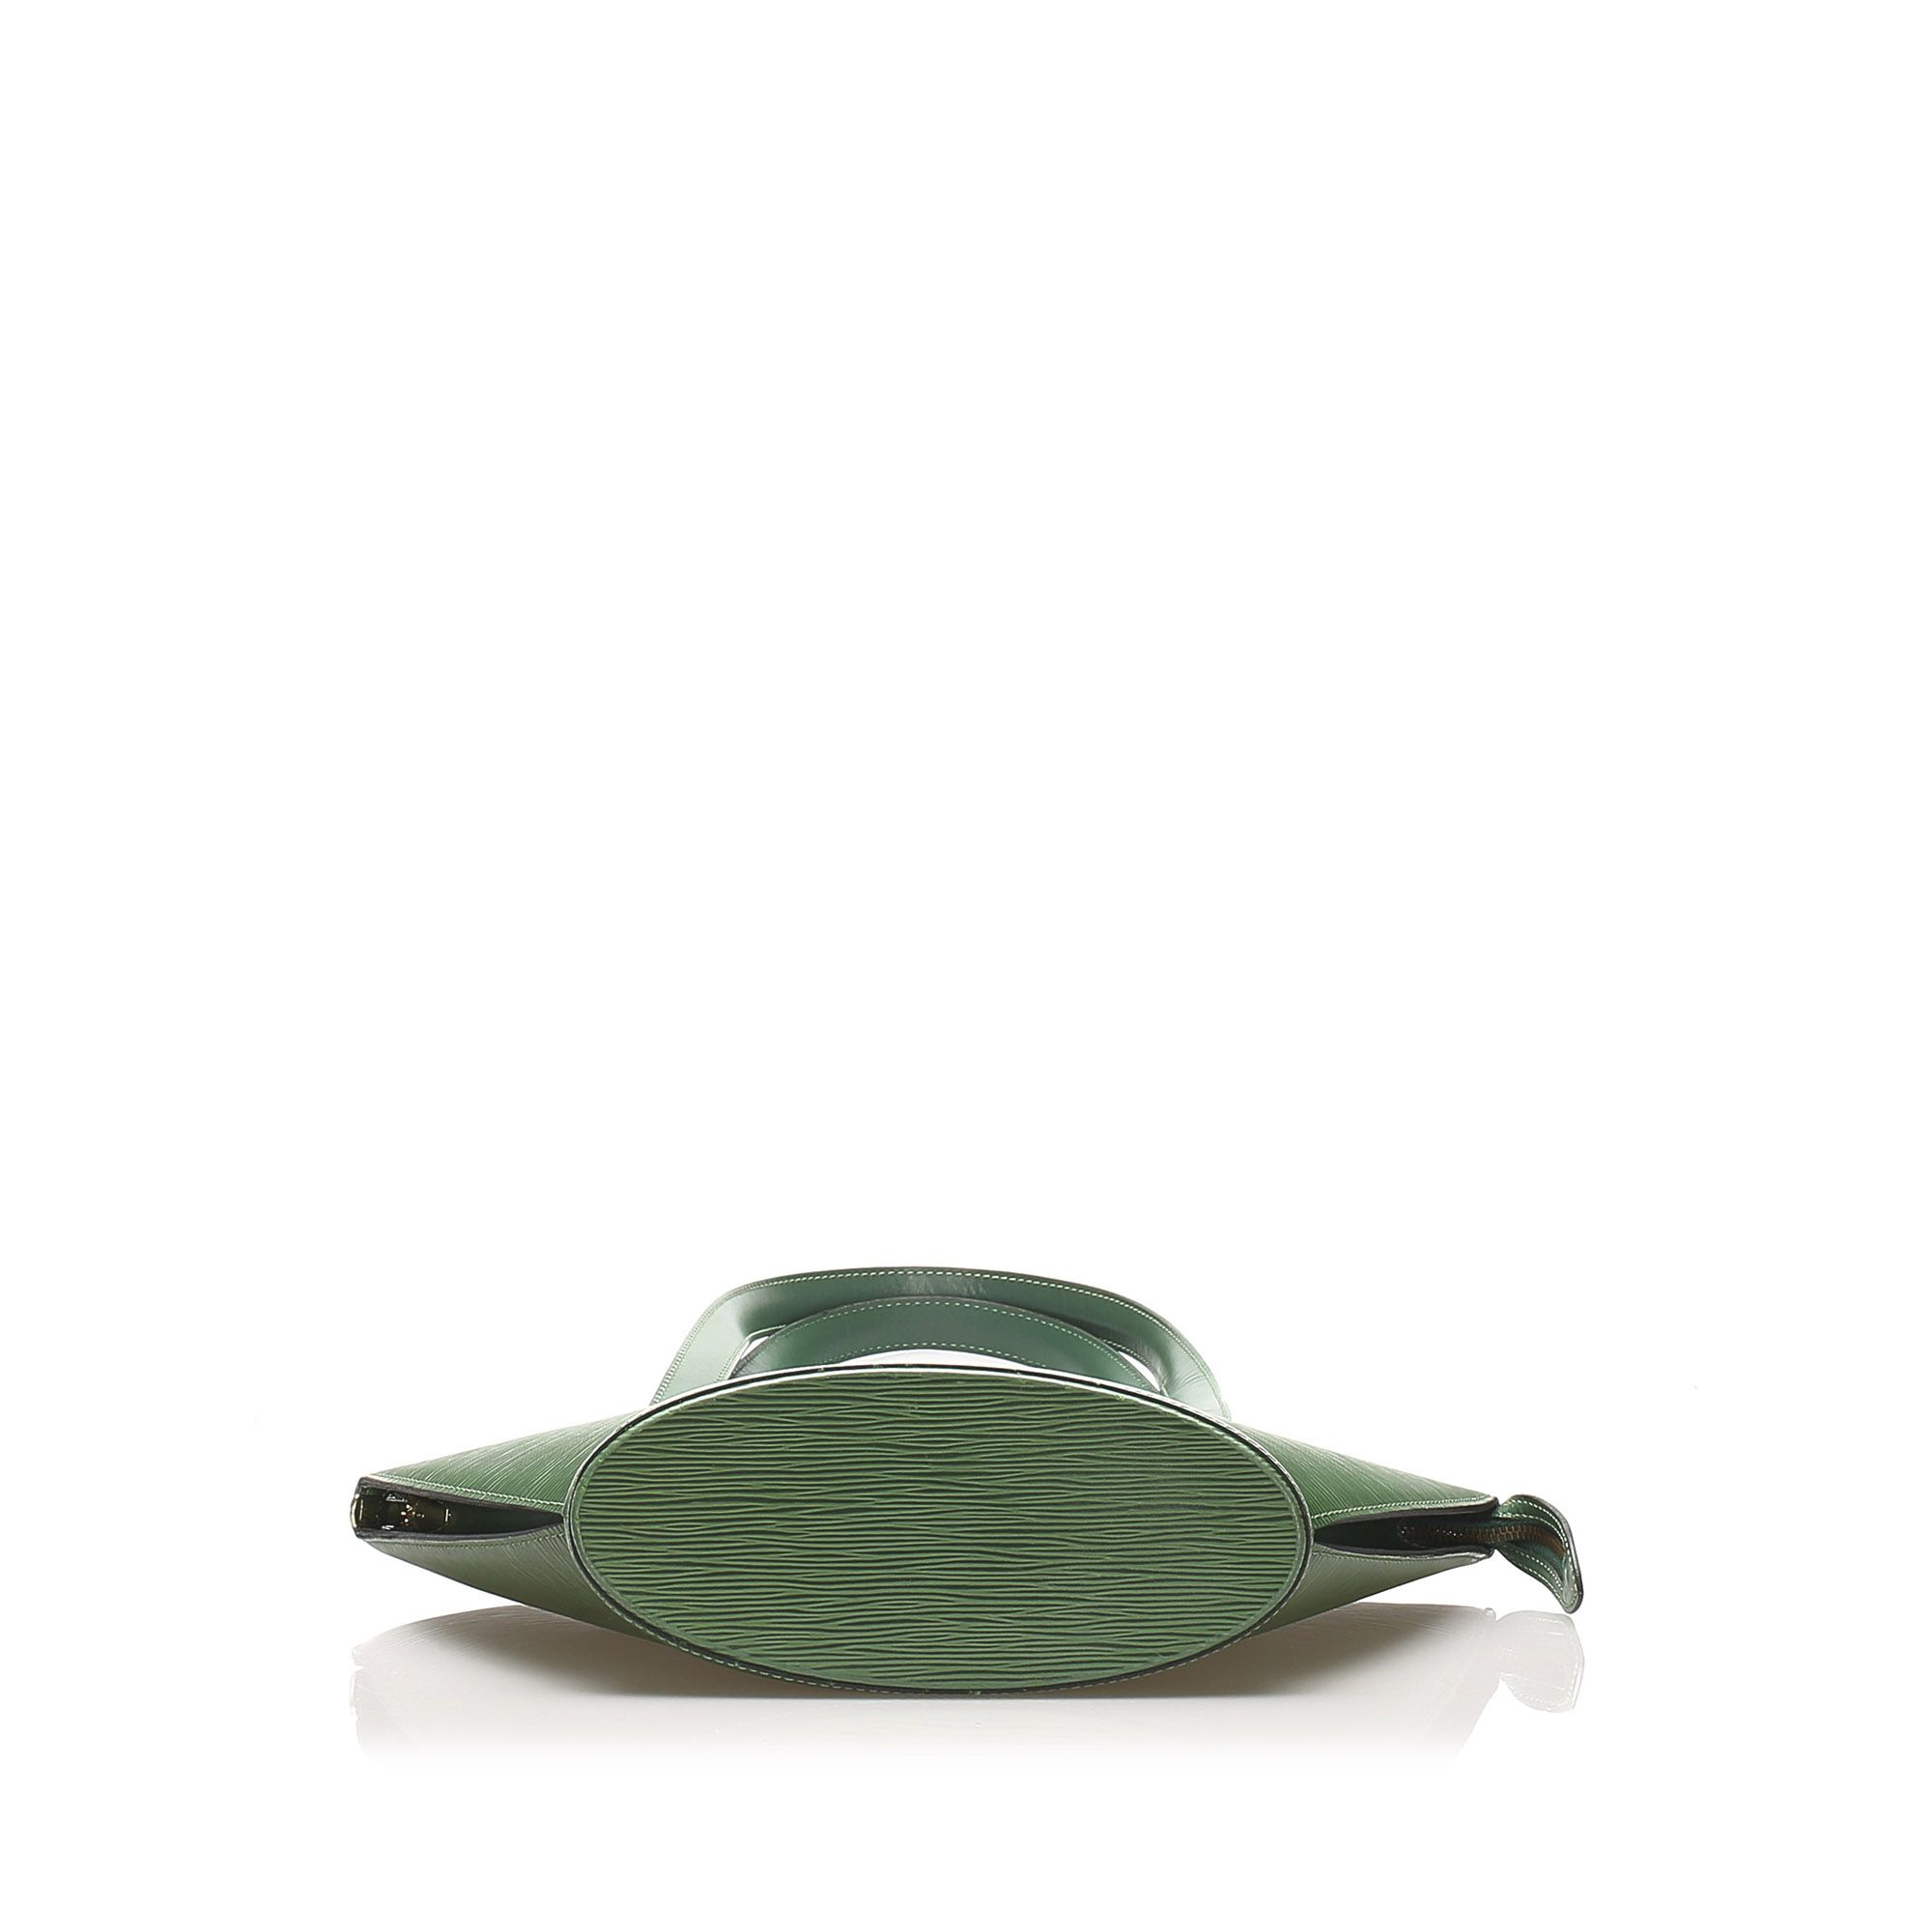 Vintage Louis Vuitton Epi Saint Jacques PM Long Strap Green